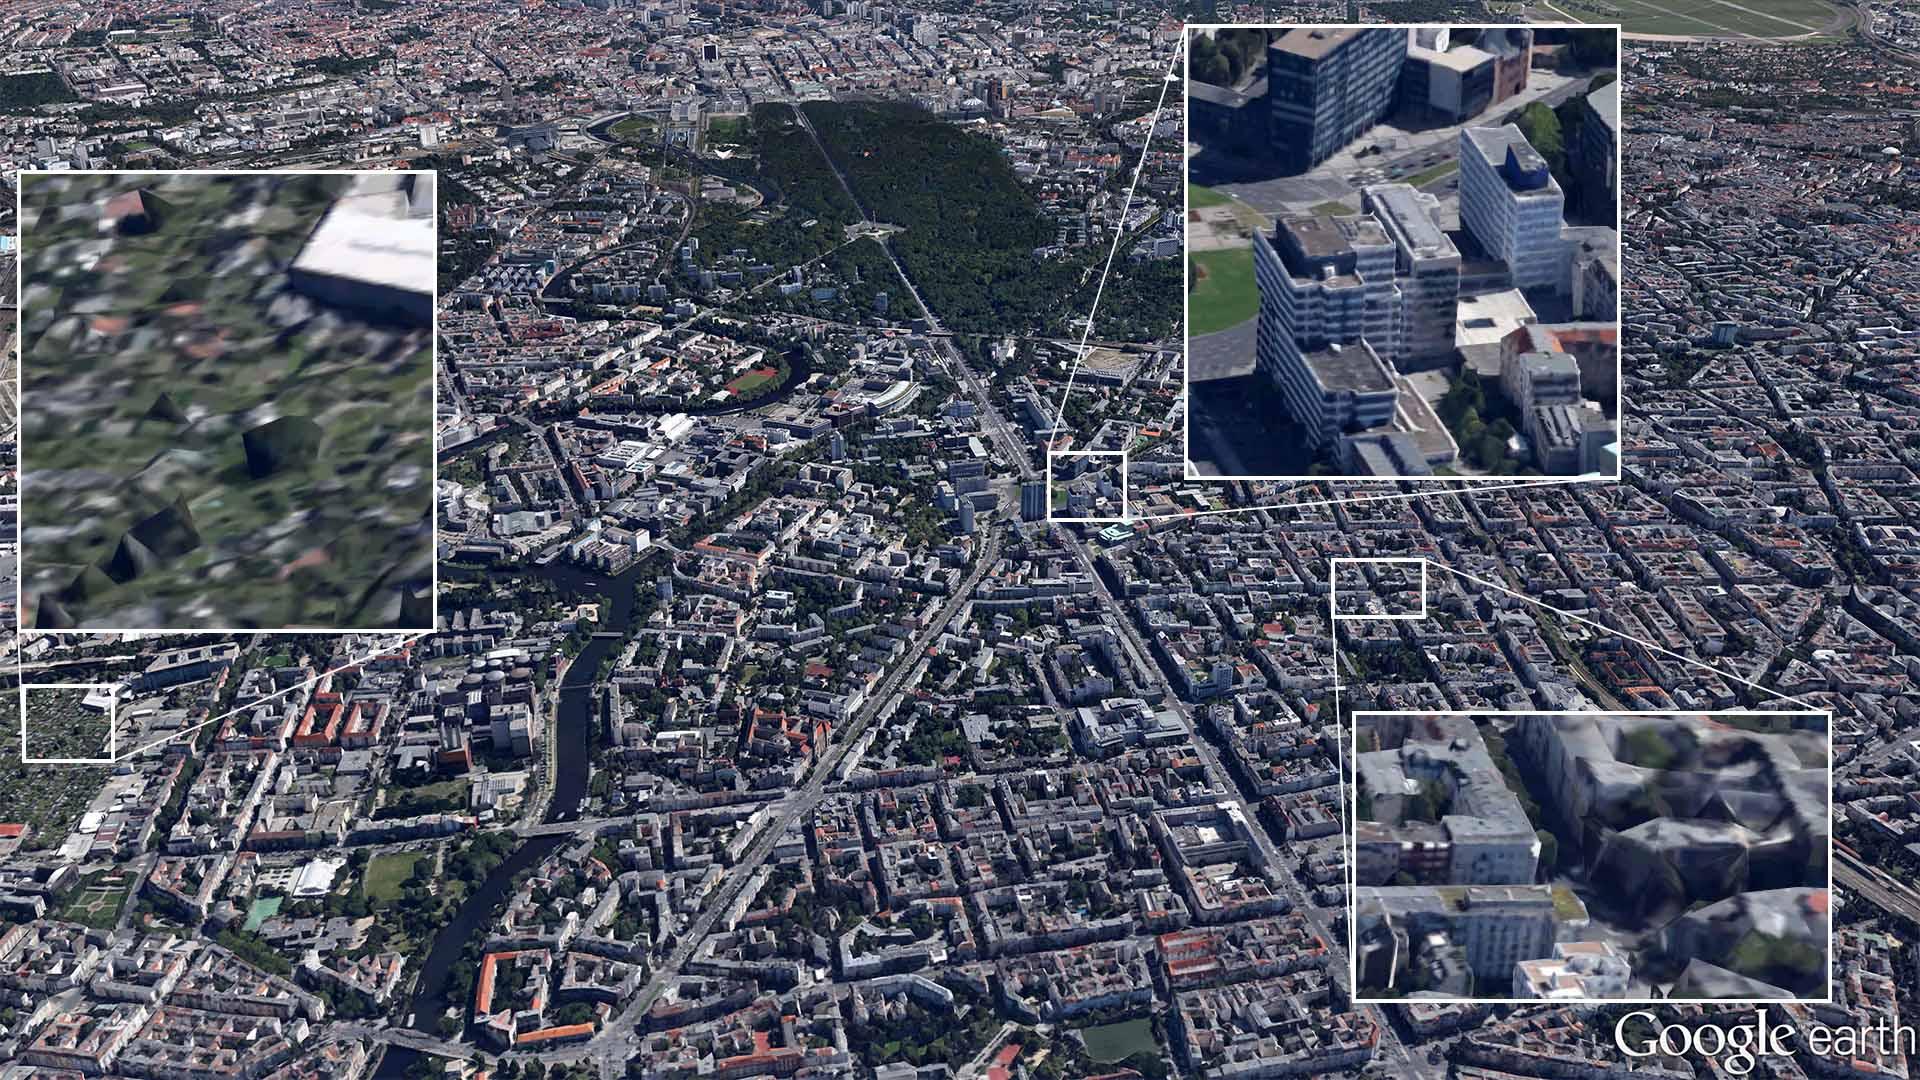 joumxyzptlk google earth in insane 100 megapixel resolution with 8x anti alias. Black Bedroom Furniture Sets. Home Design Ideas